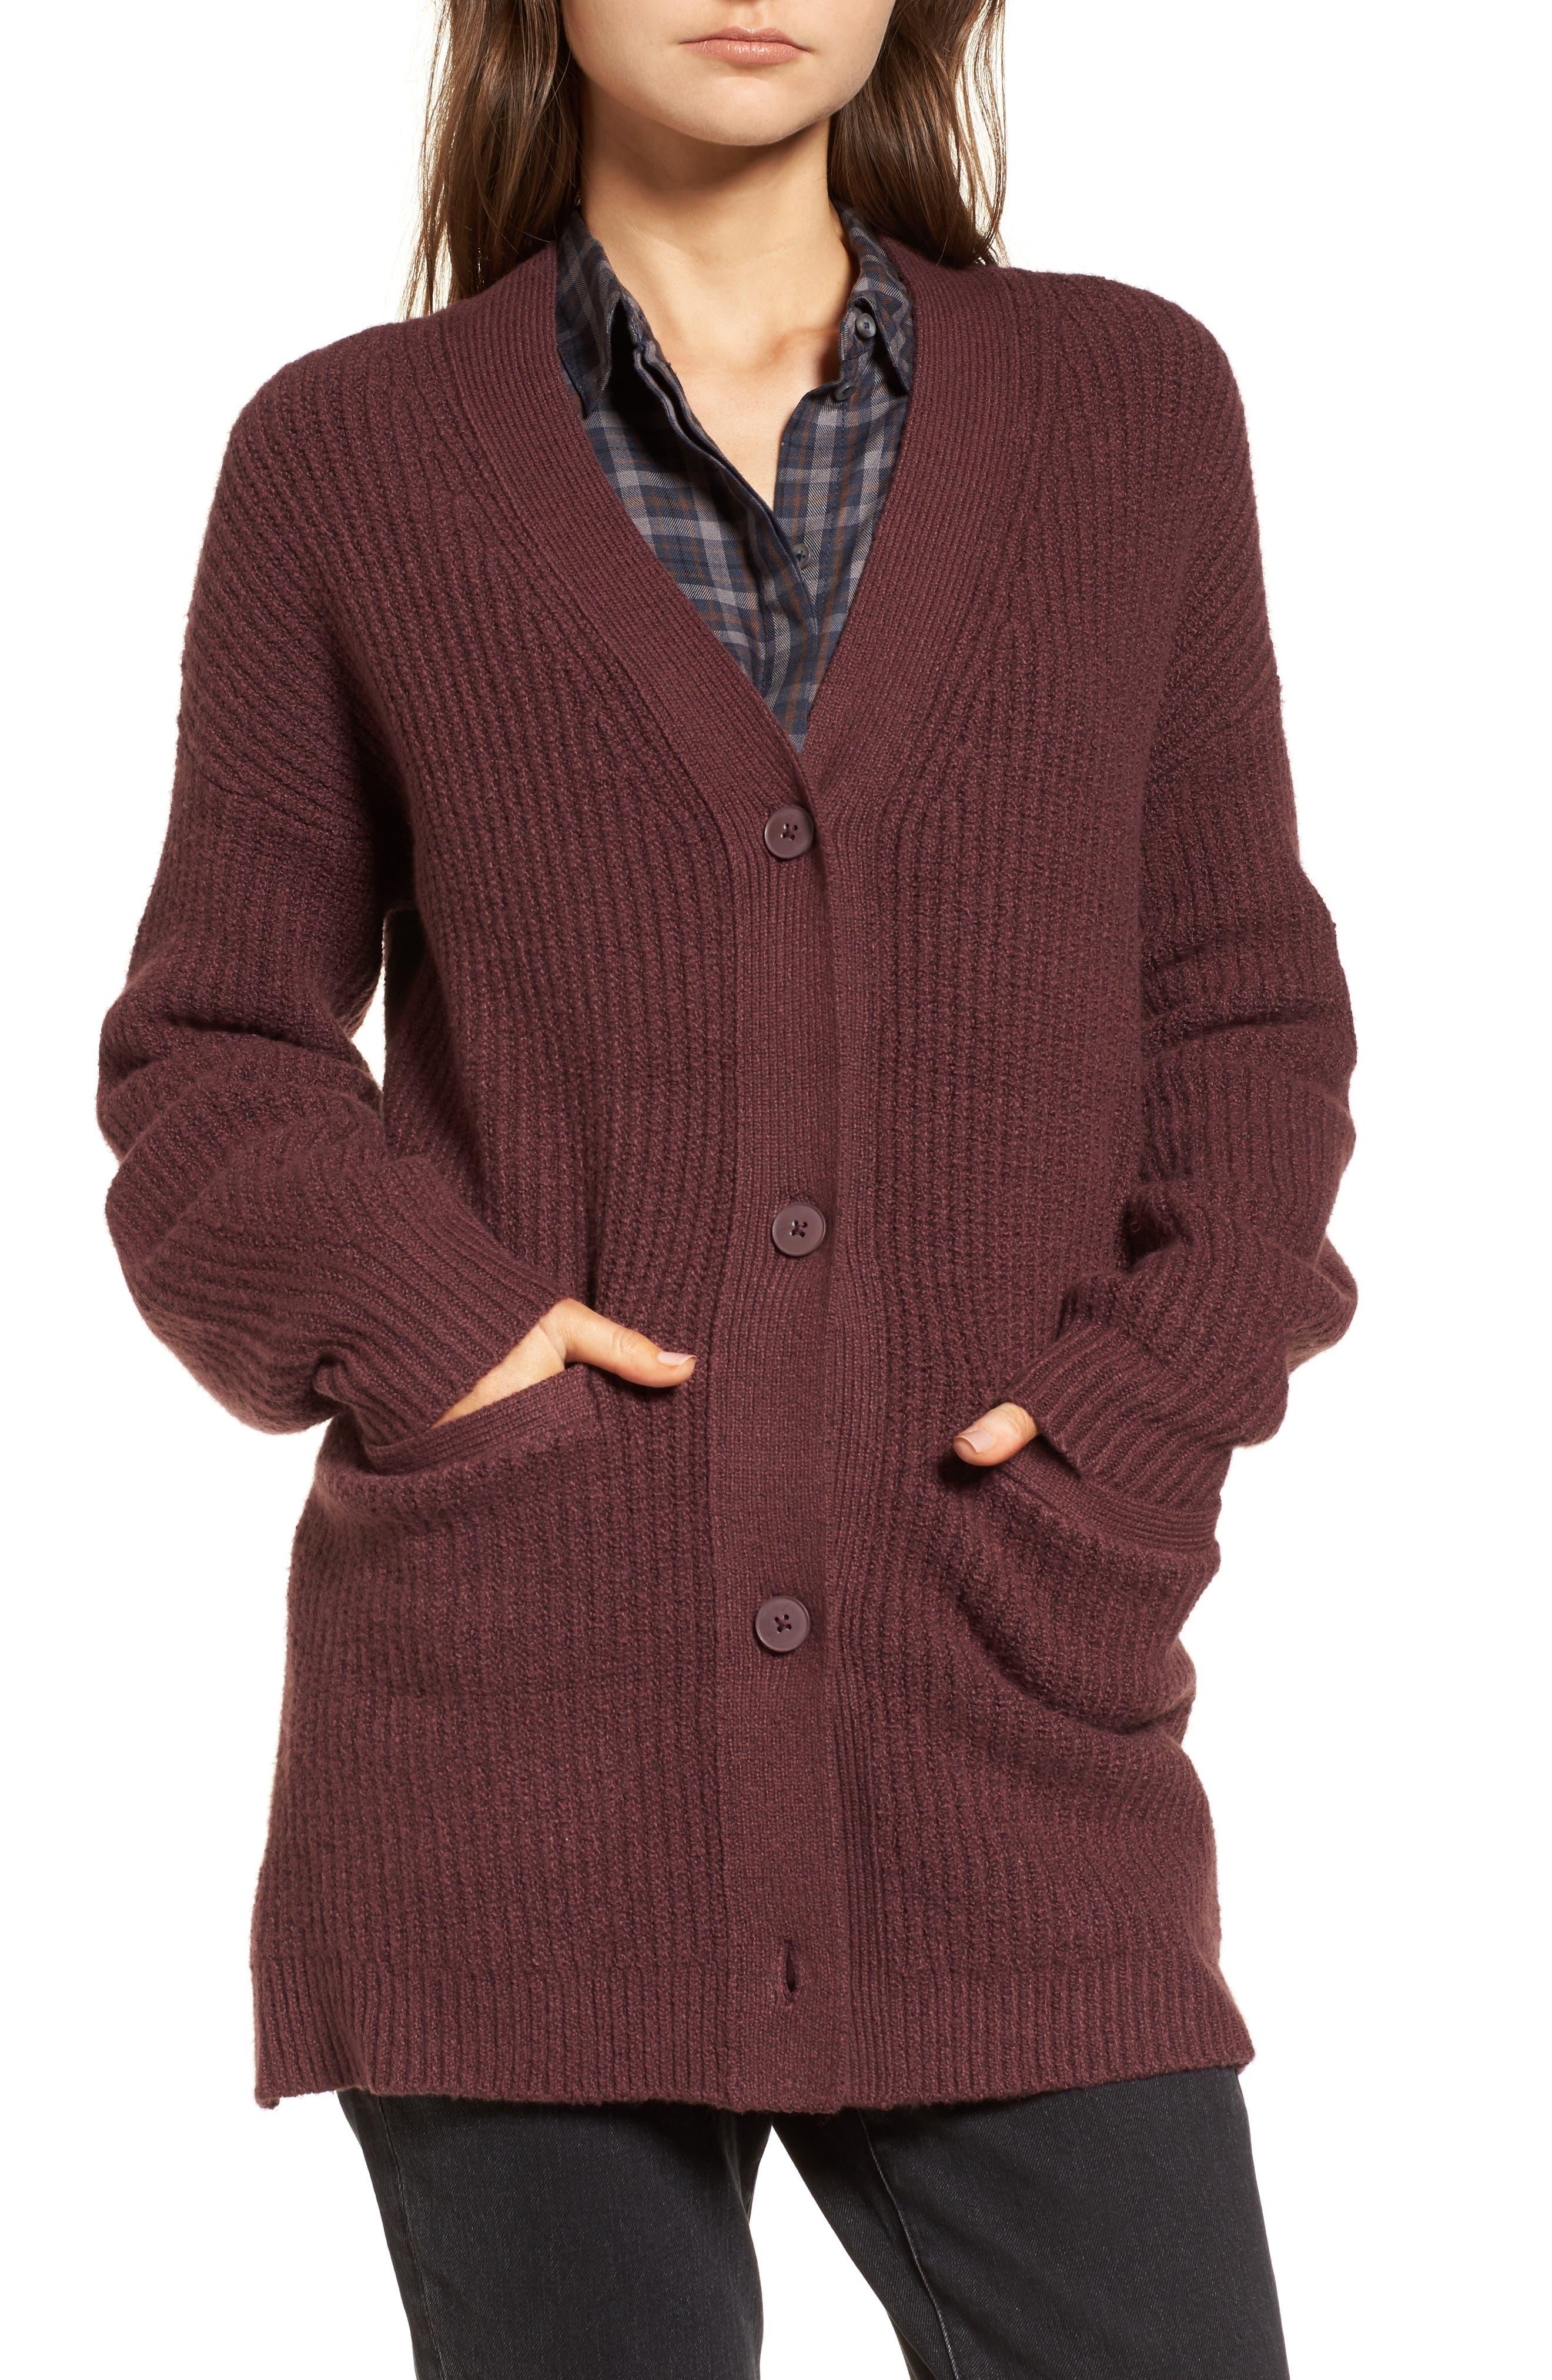 Ribbed Cardigan Sweater,                             Alternate thumbnail 4, color,                             930